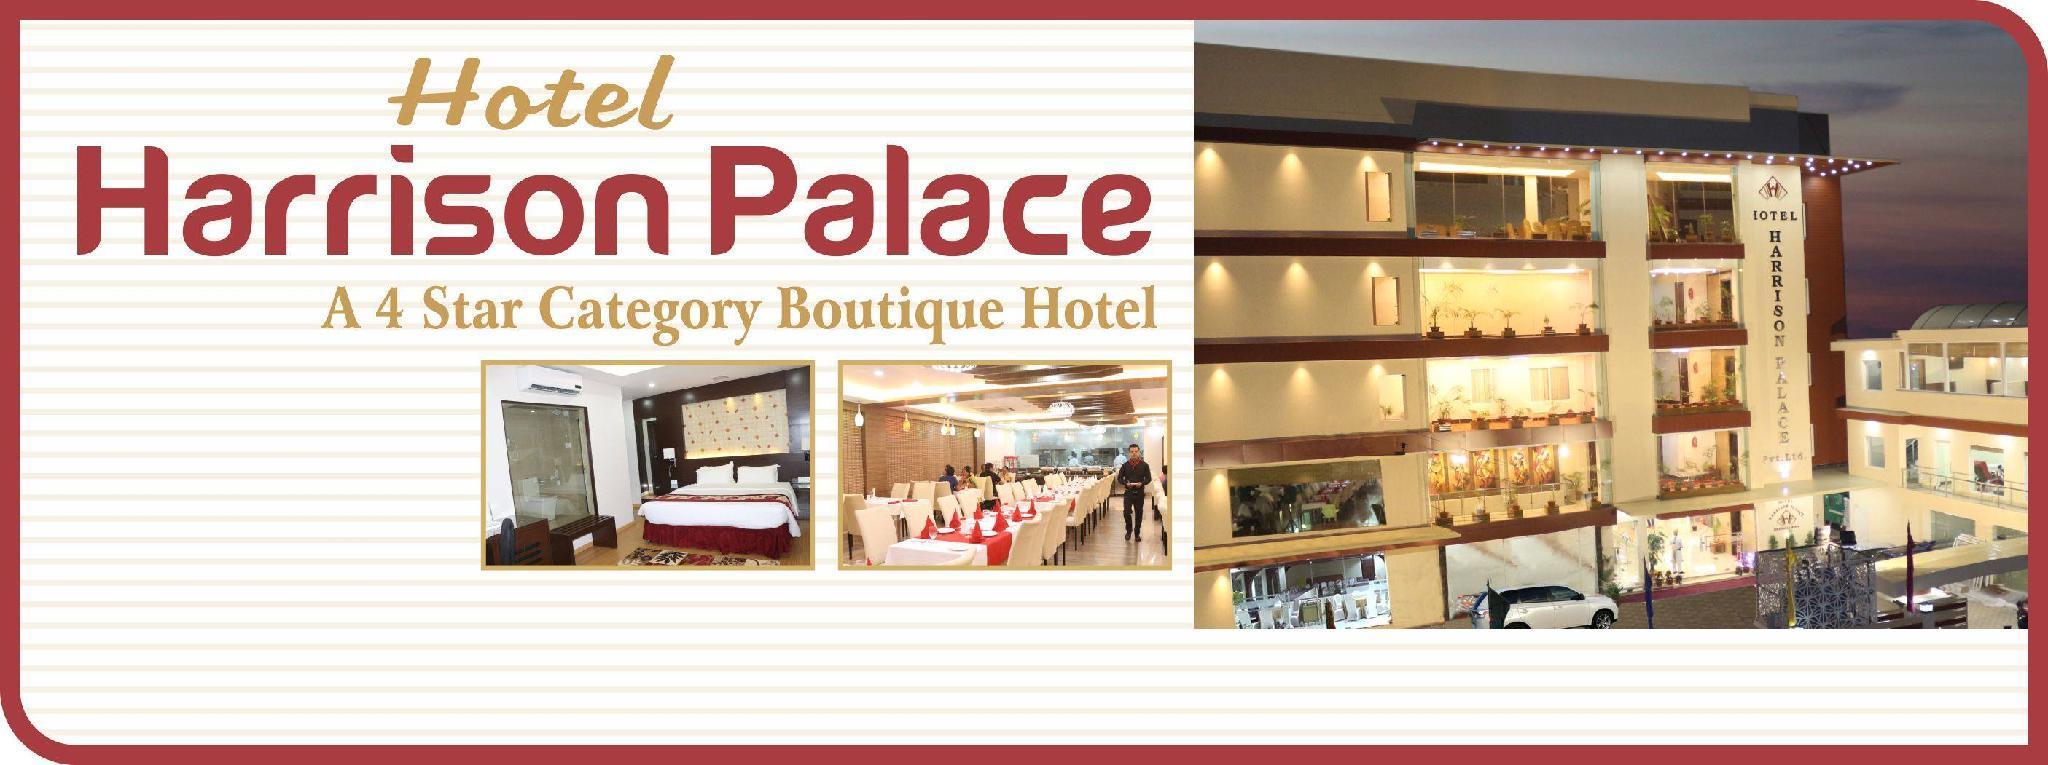 Hotel Harrison Palace